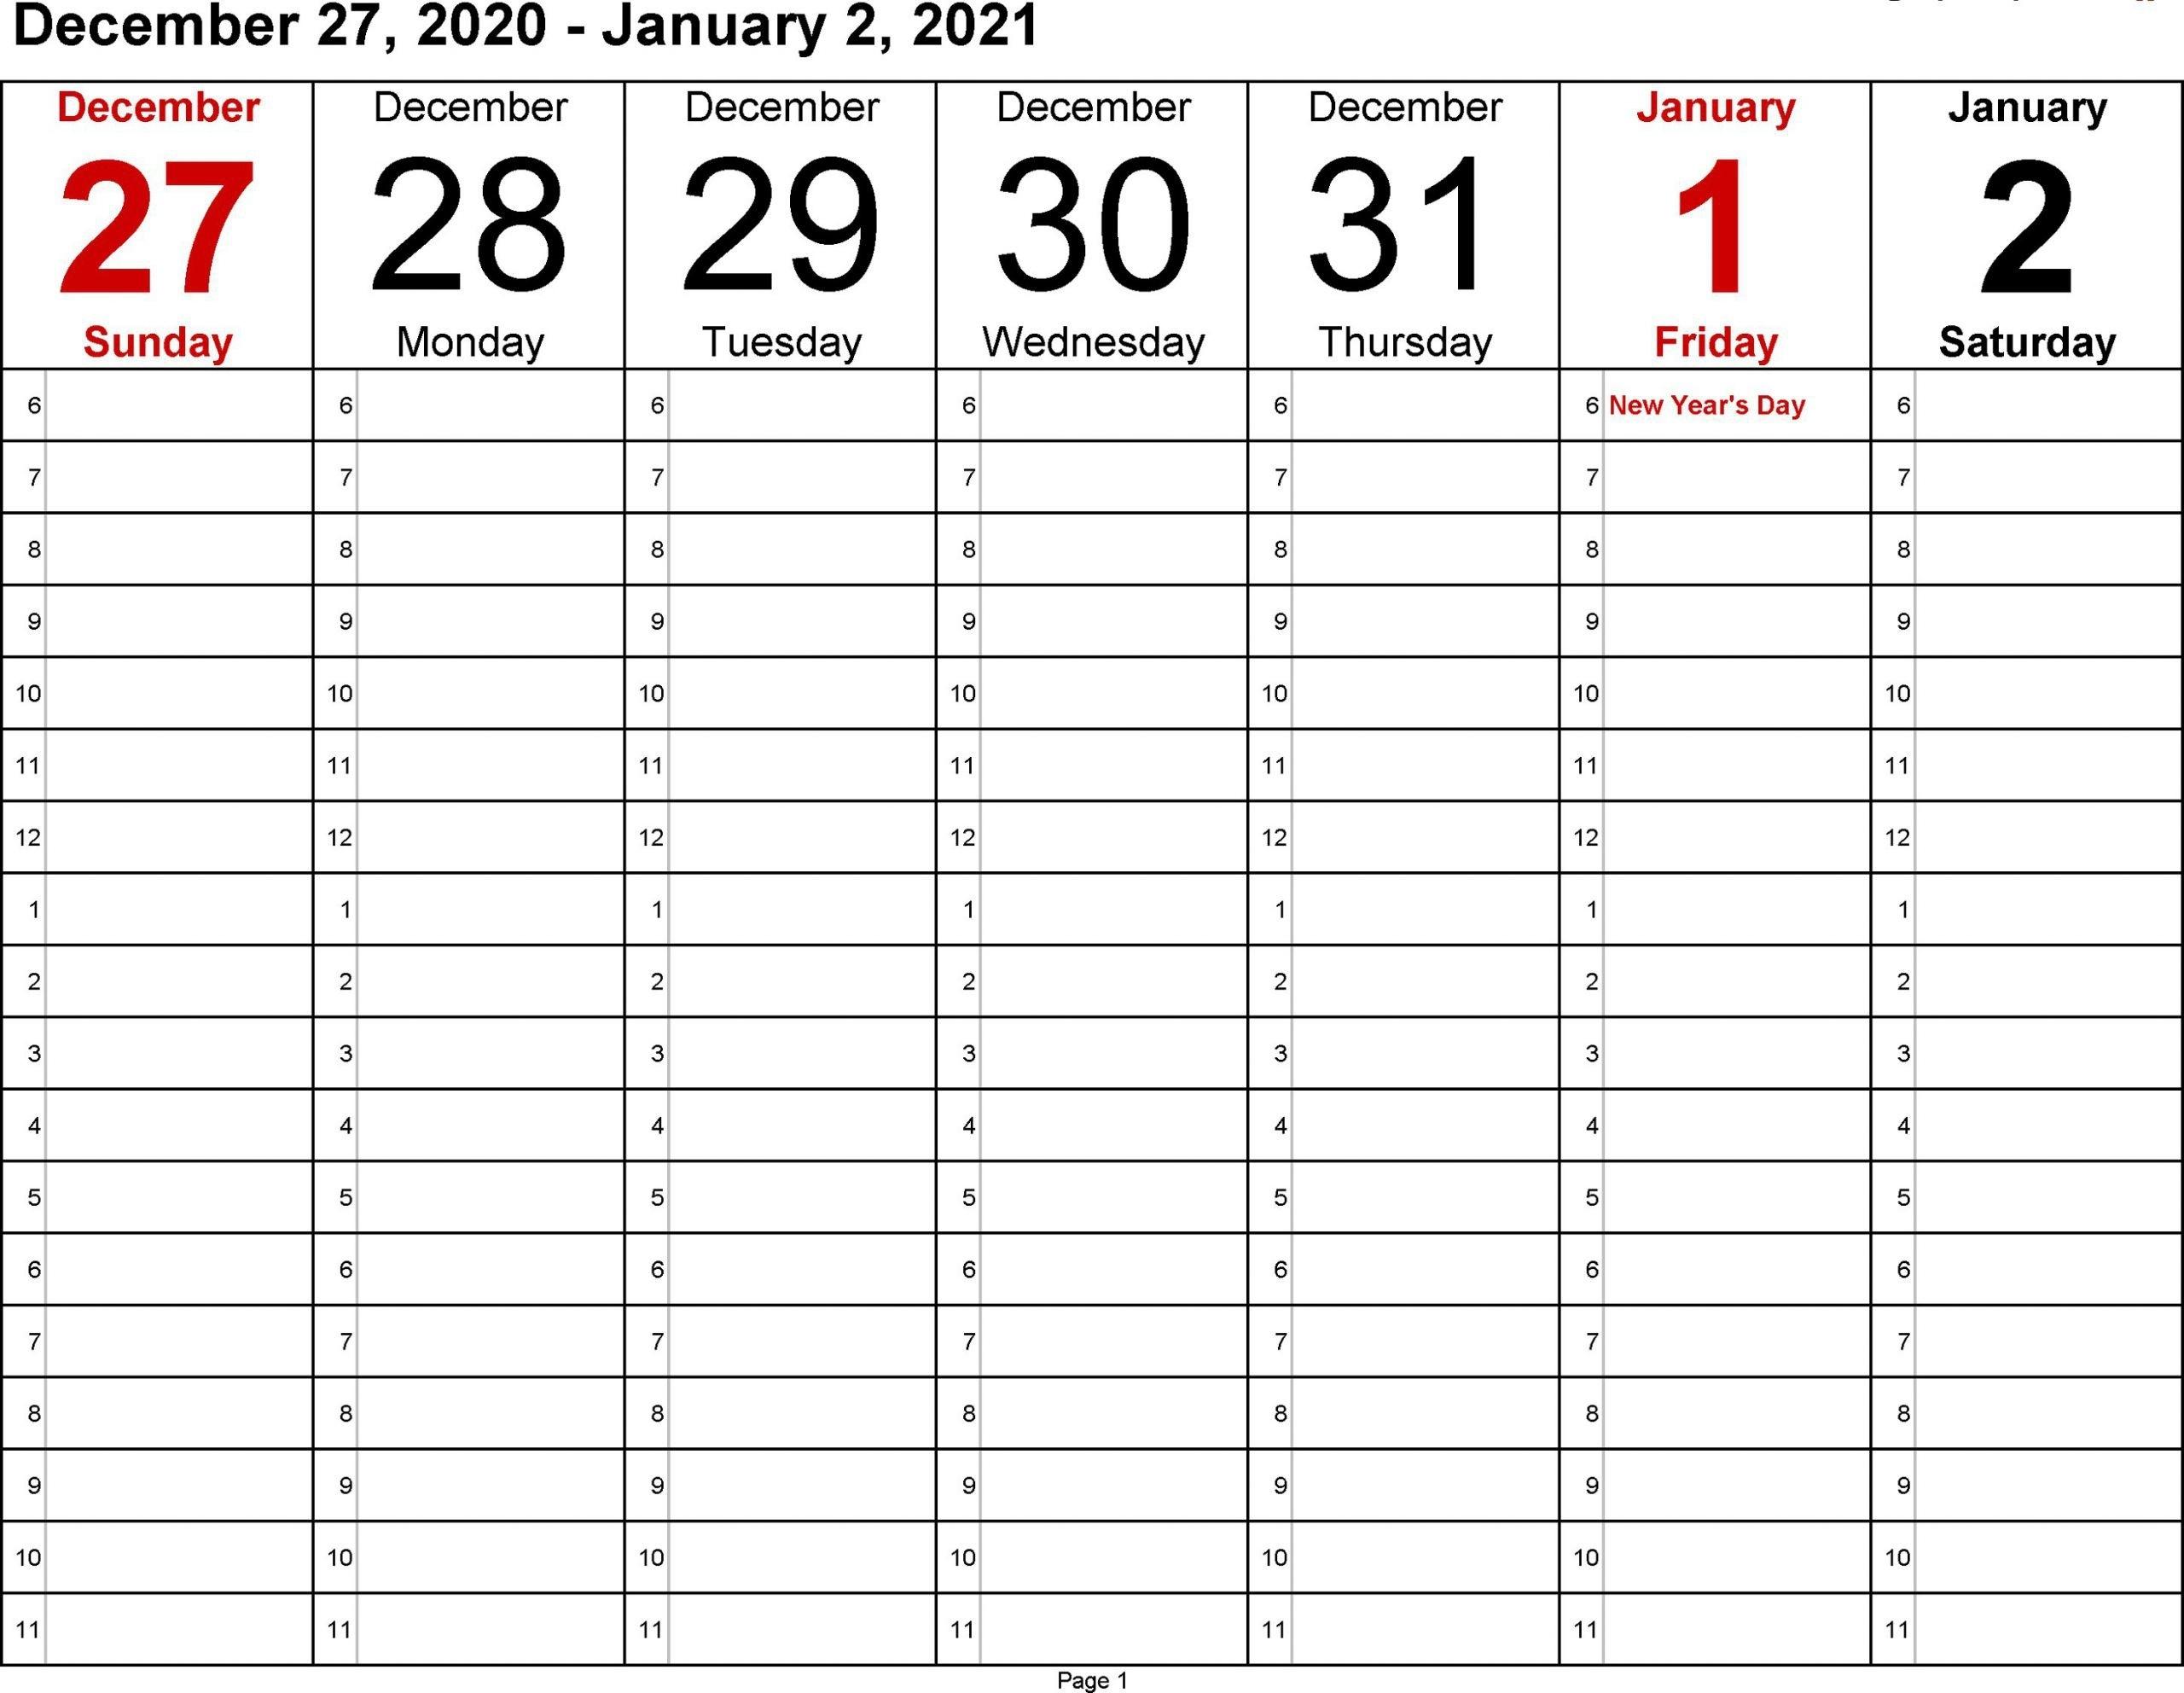 January 2021 Weekly Calendar | Printable Calendar Design